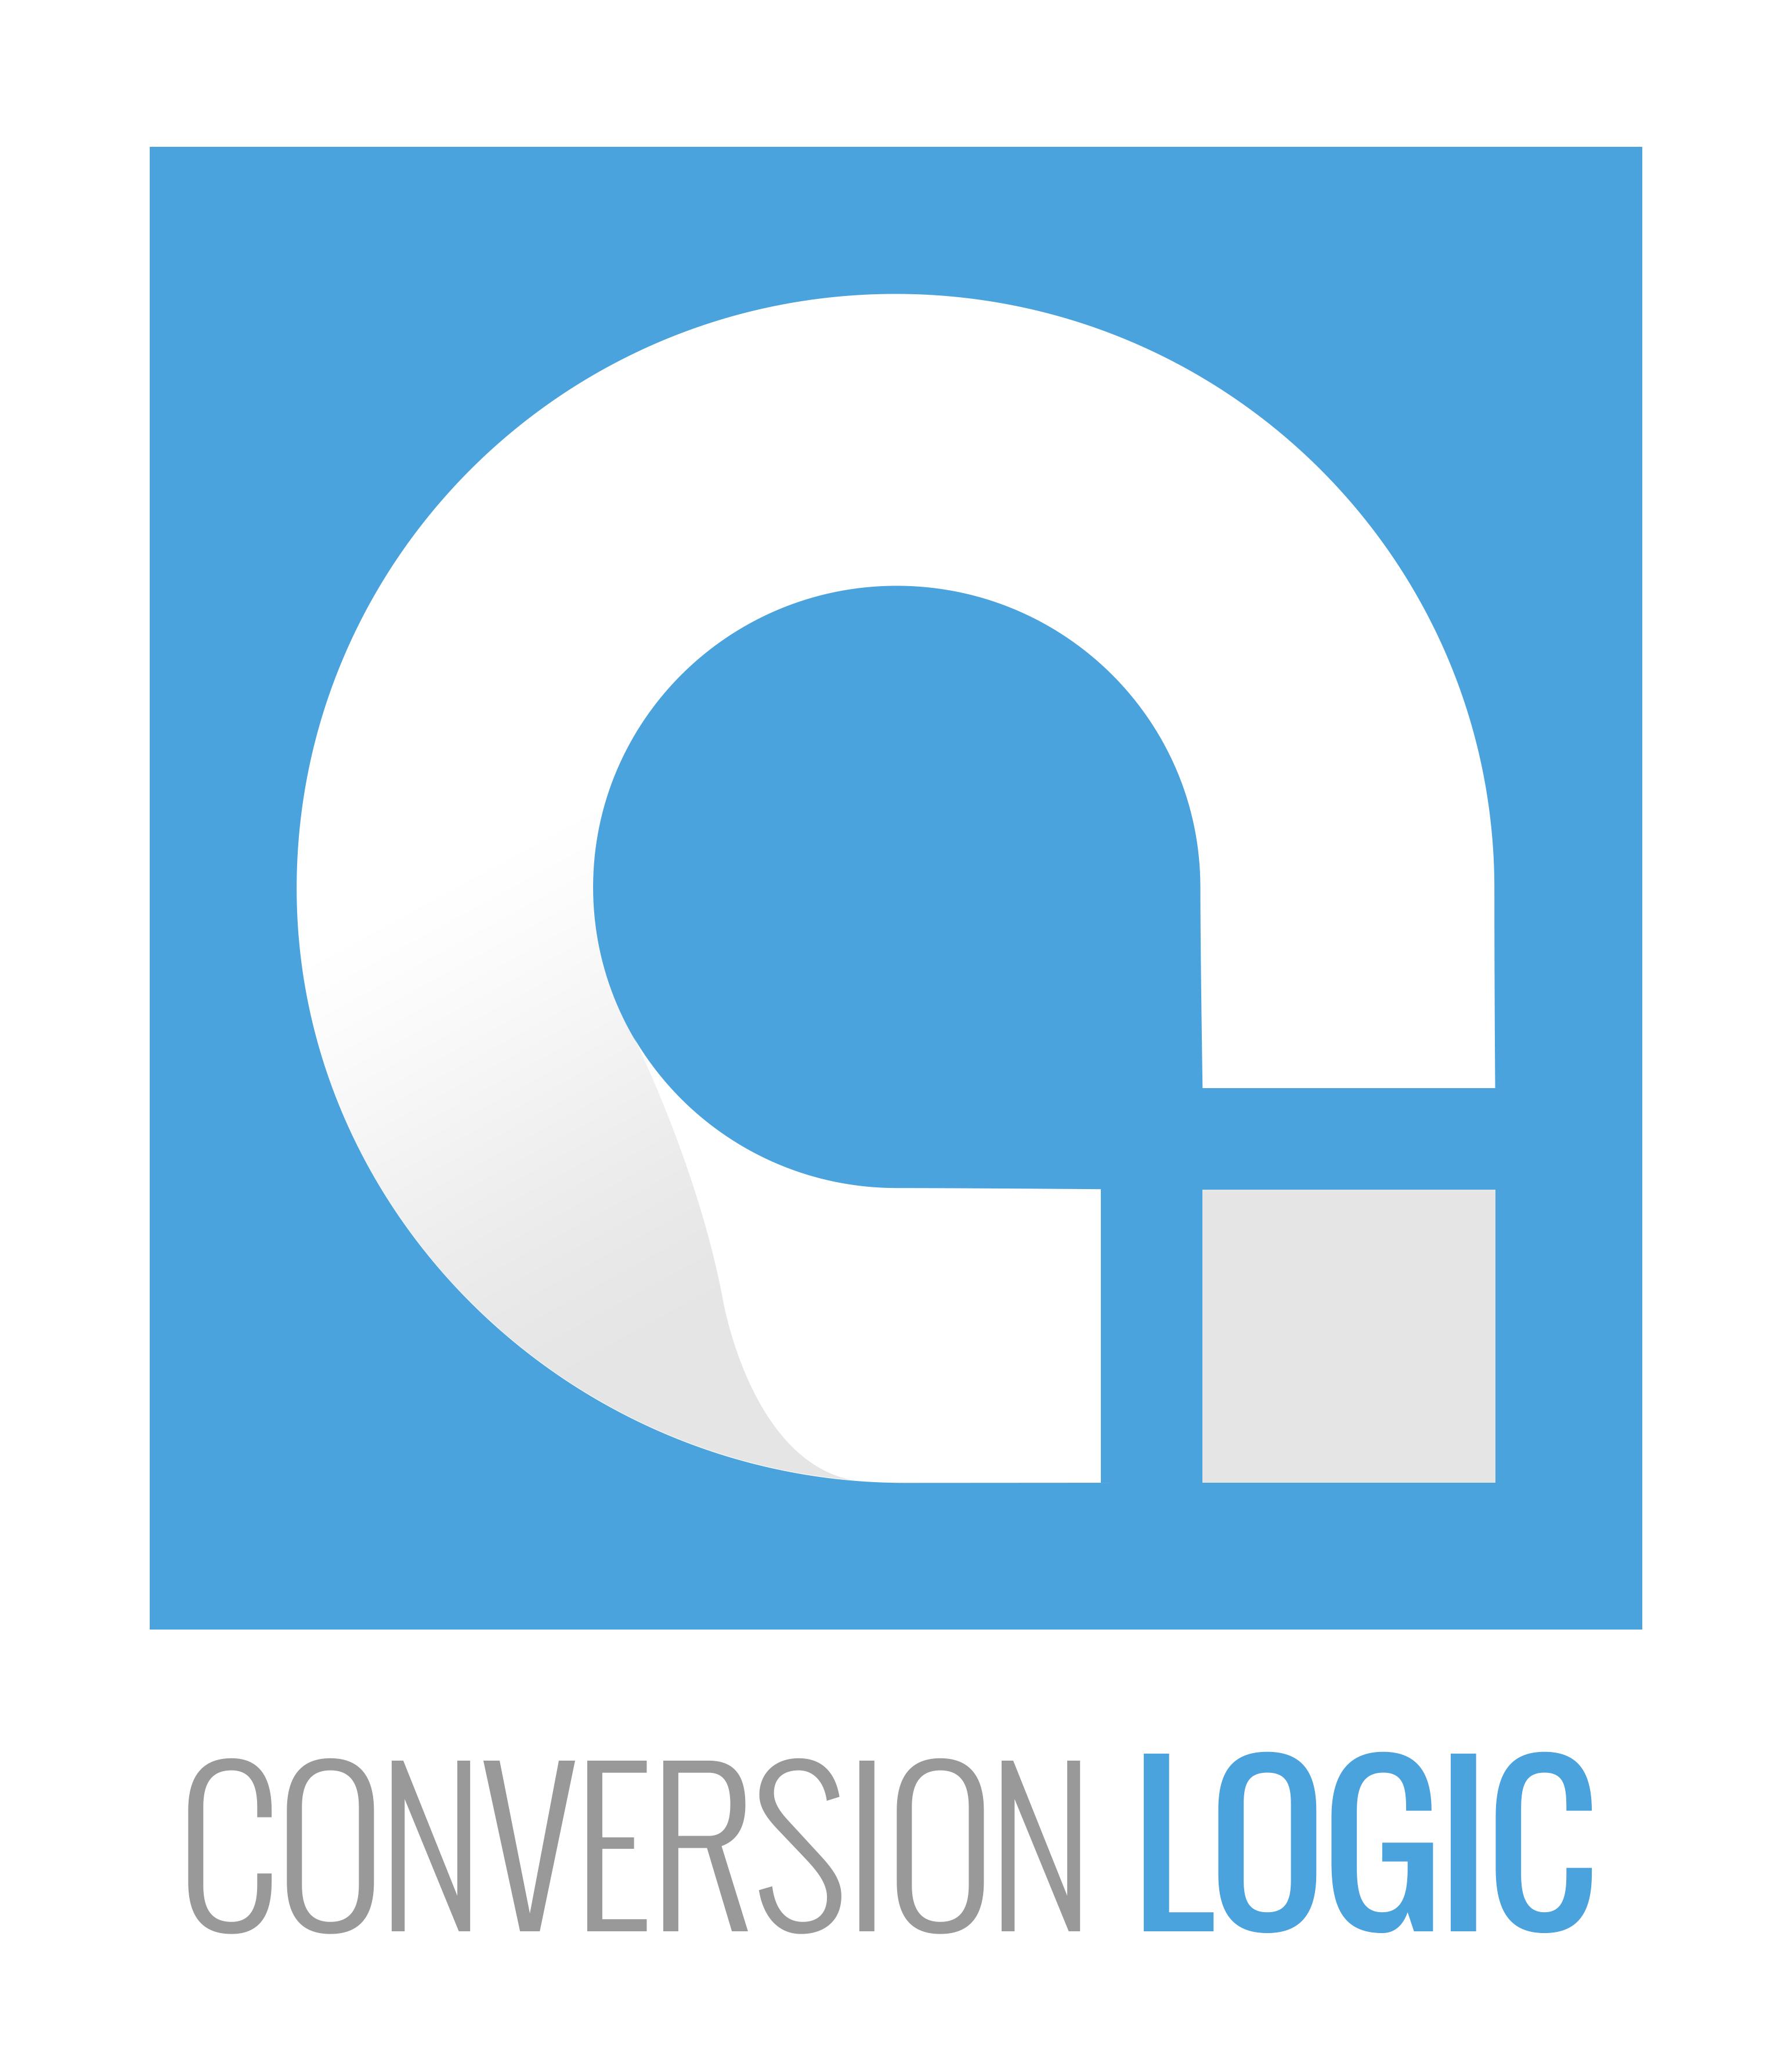 ConversionLogic_logo